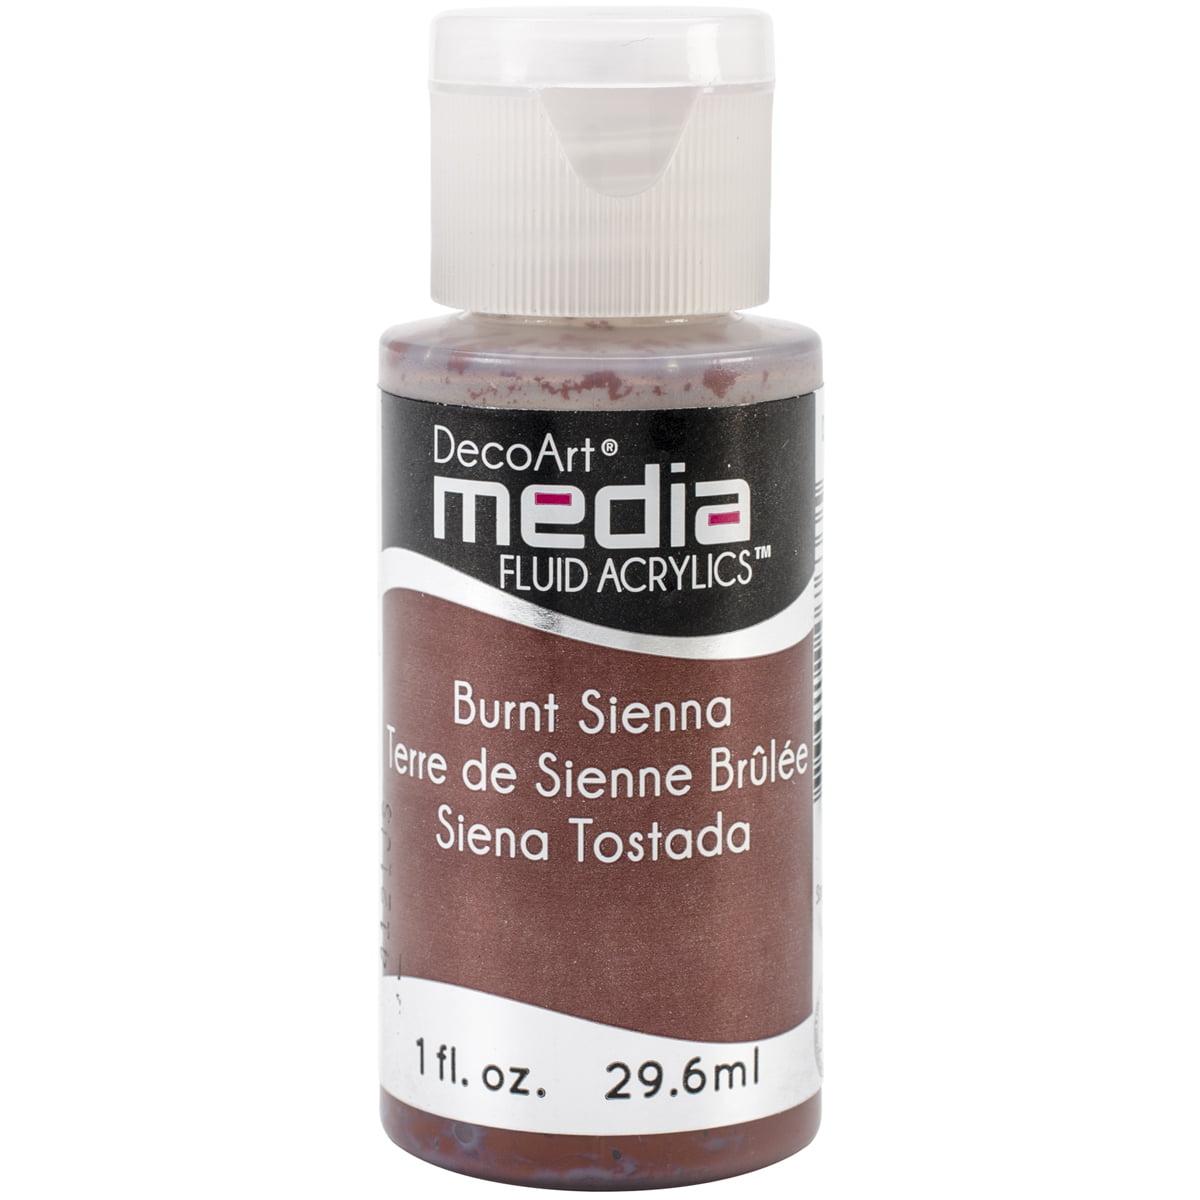 Media Fluid Acrylic Paint 1oz-Burnt Sienna (Series 1)